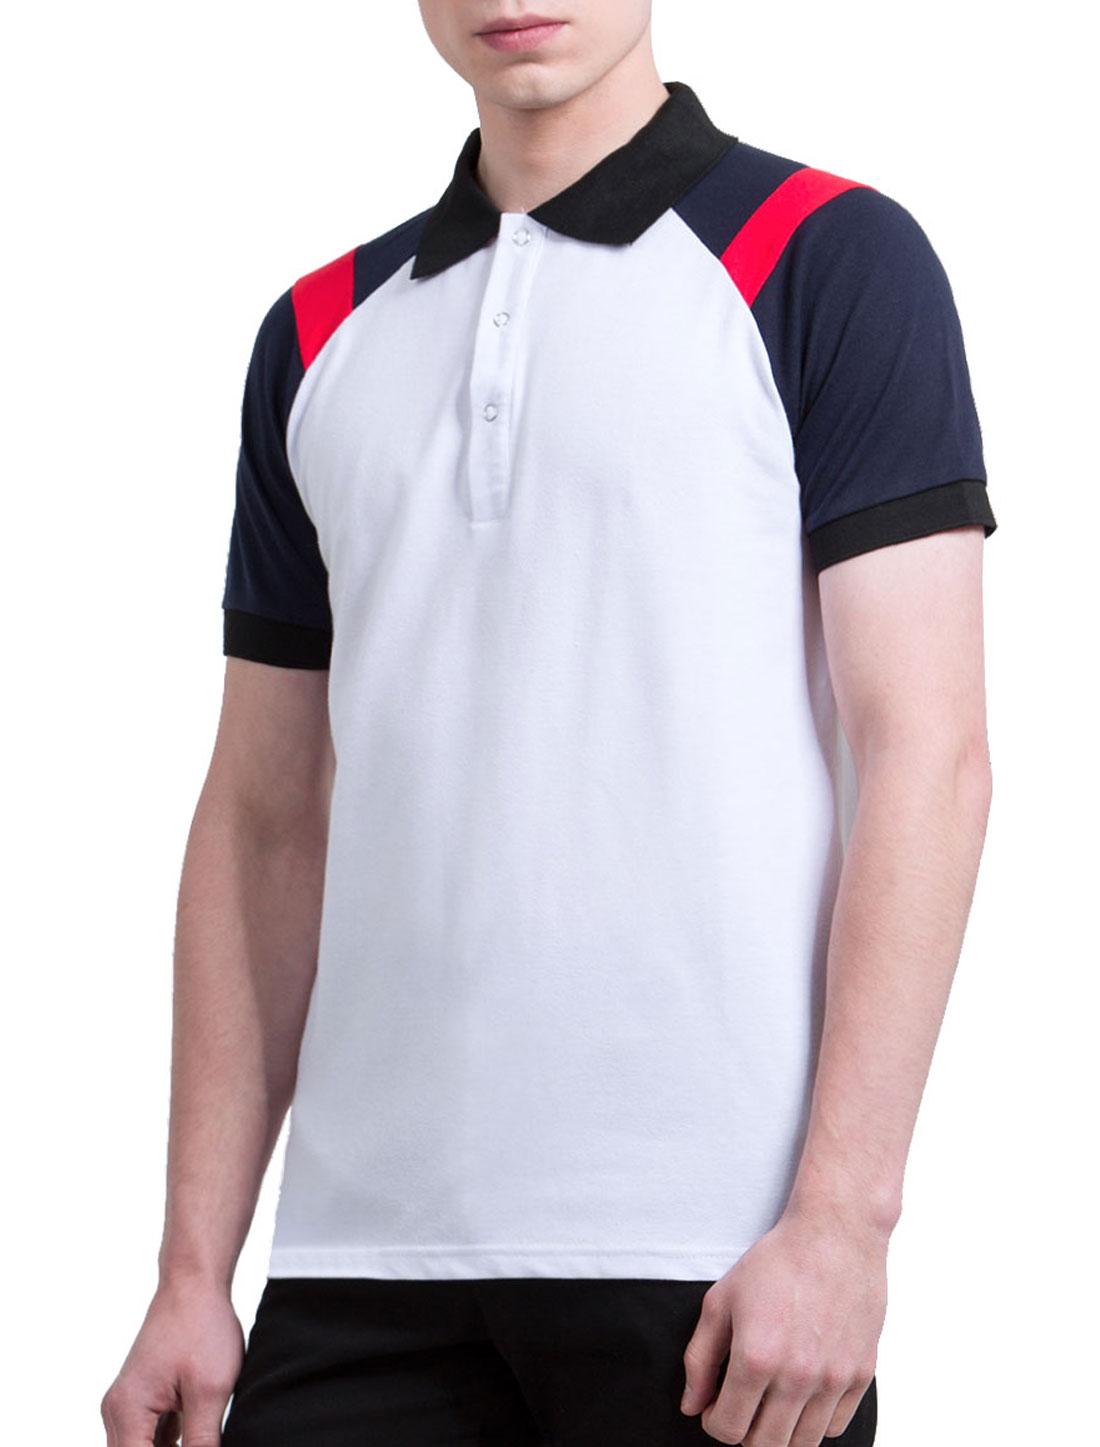 Men Contrast Color Short Raglan Sleeves Polo Shirt White L